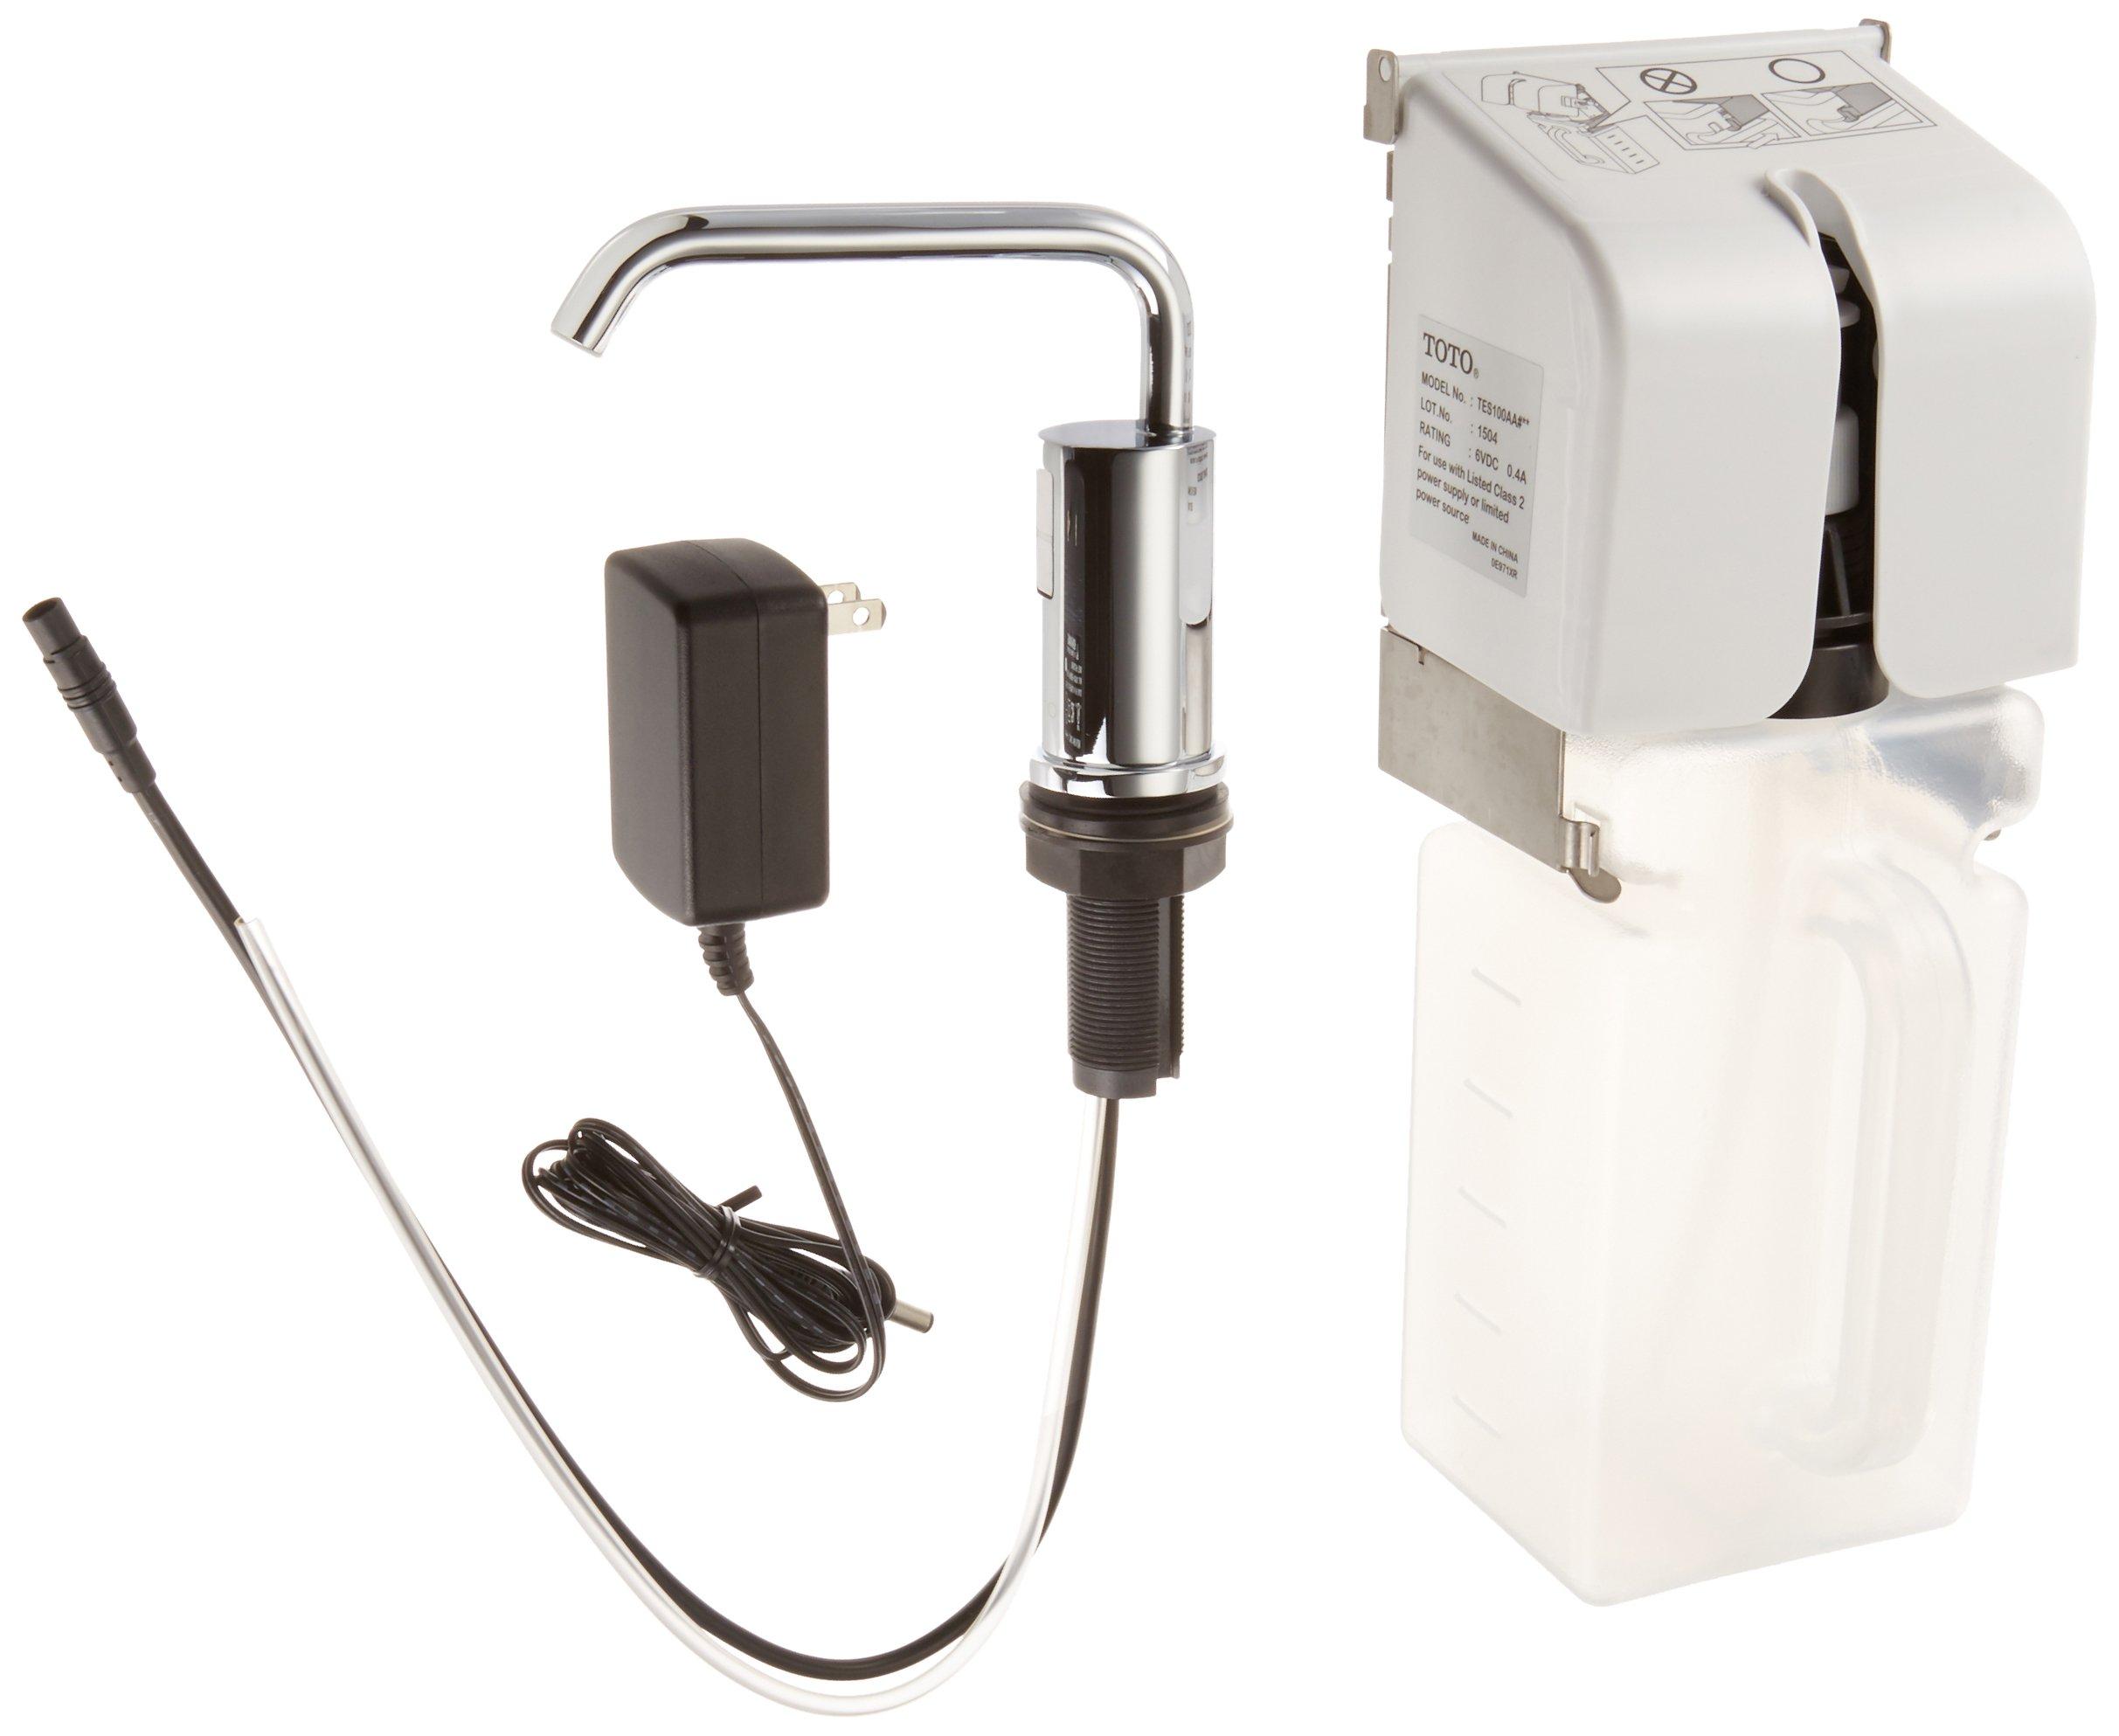 TOTO TES100AA#CP Sensor Operated Automatic Soap Dispenser, Polished Chrome